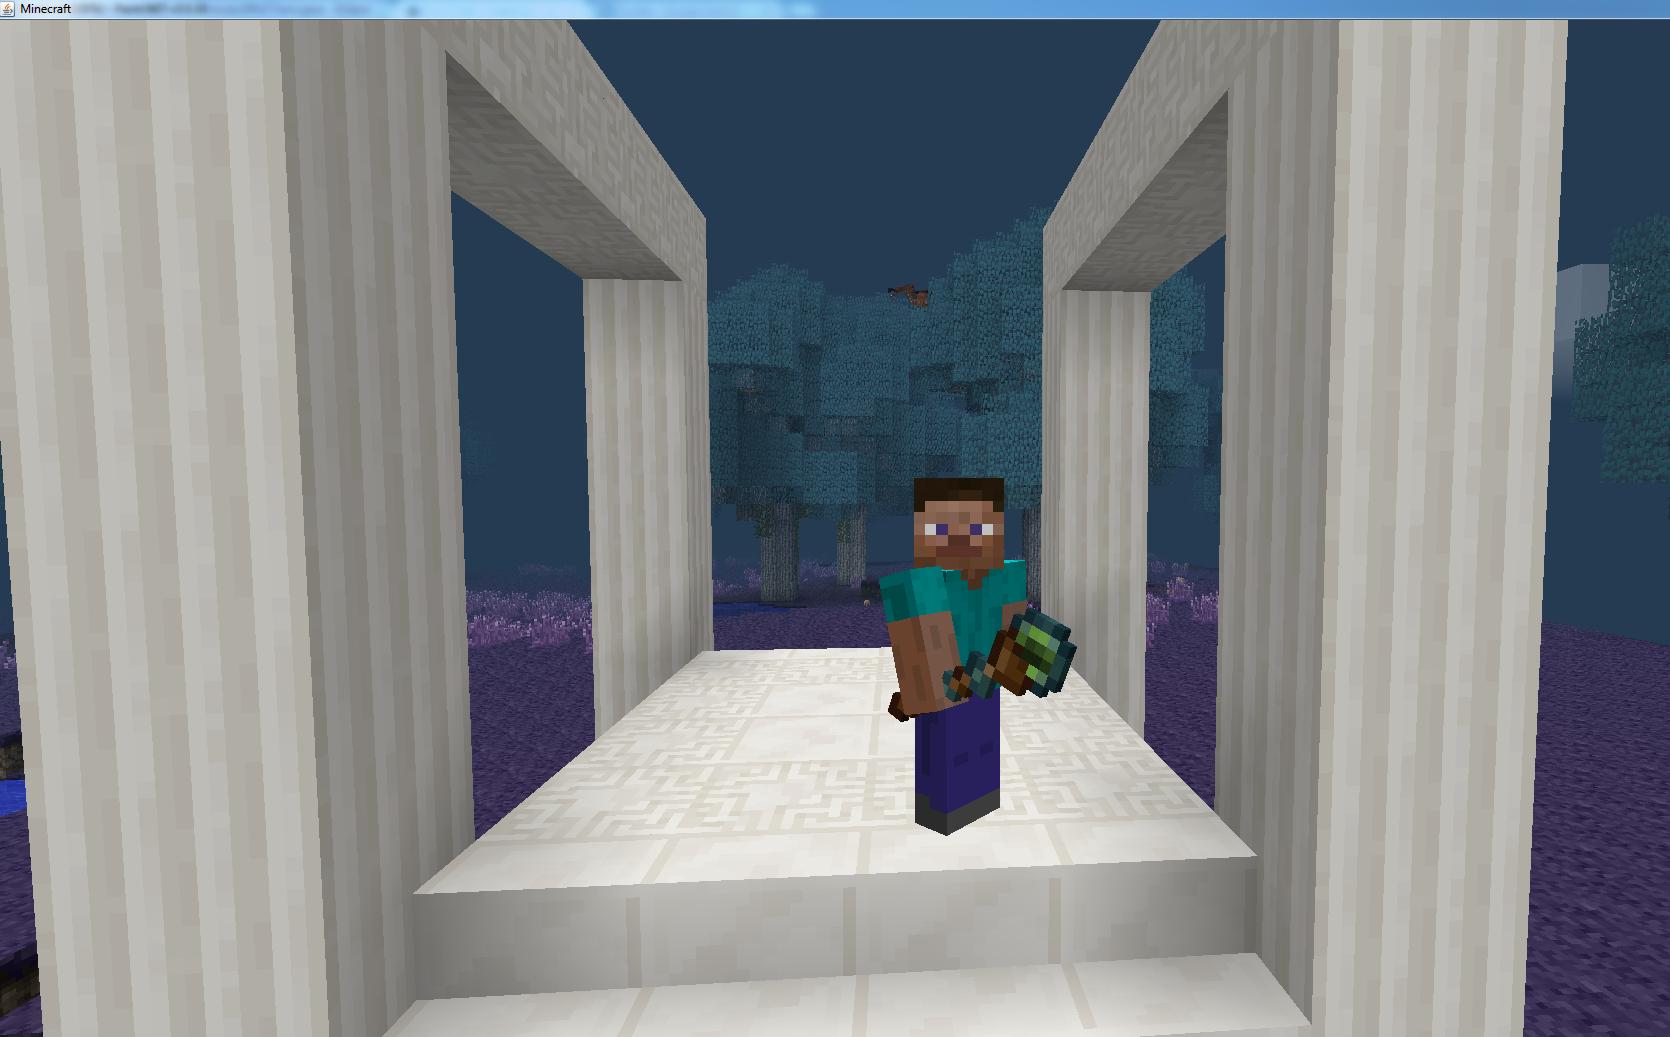 Mo-Creatures-Minecraft-Mod-portal